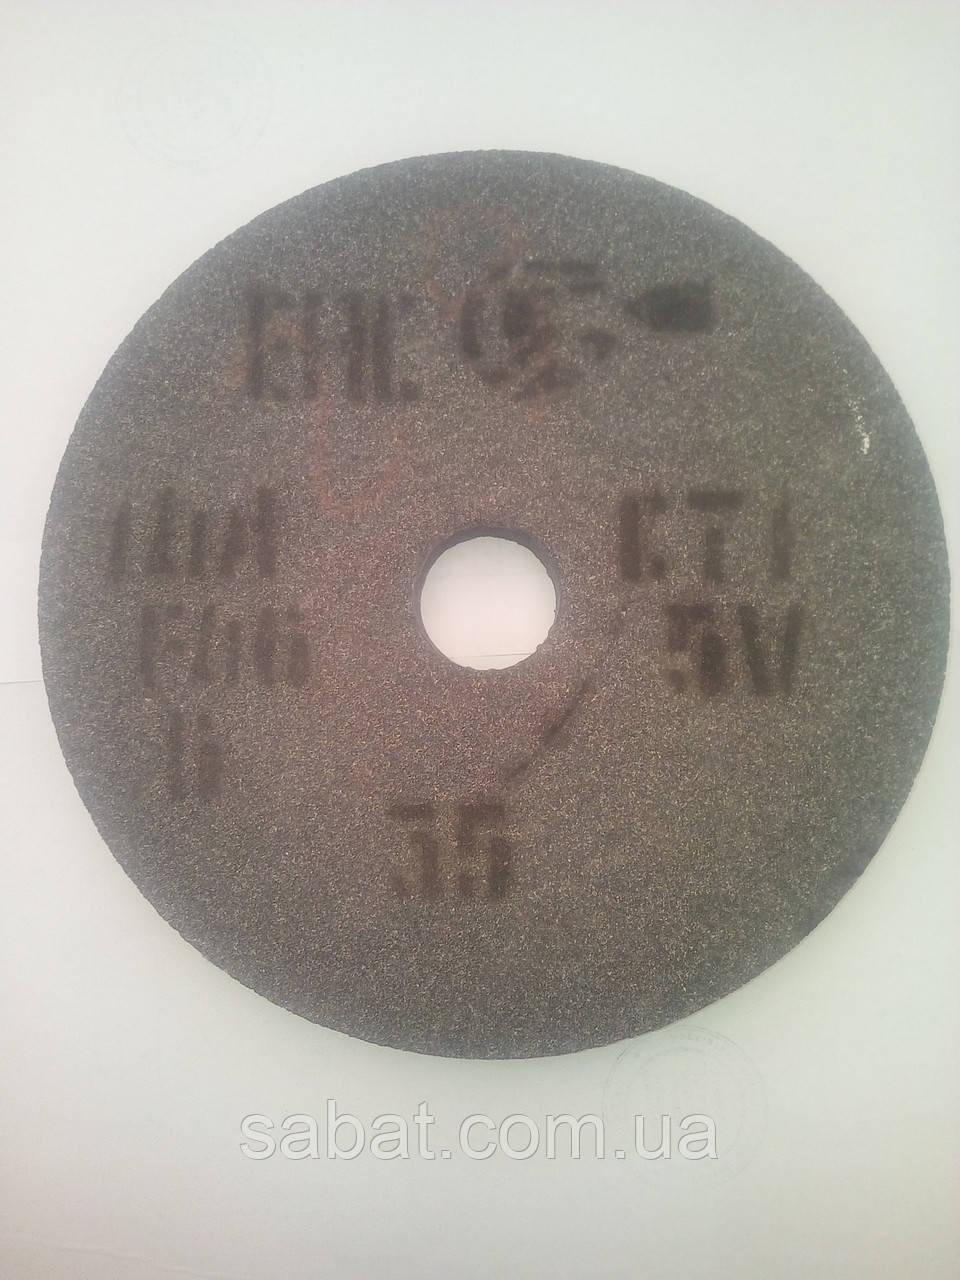 Круг шлифовальный серый 14А F46-80 СТ-СМ 400Х40х203 (электрокорунд)